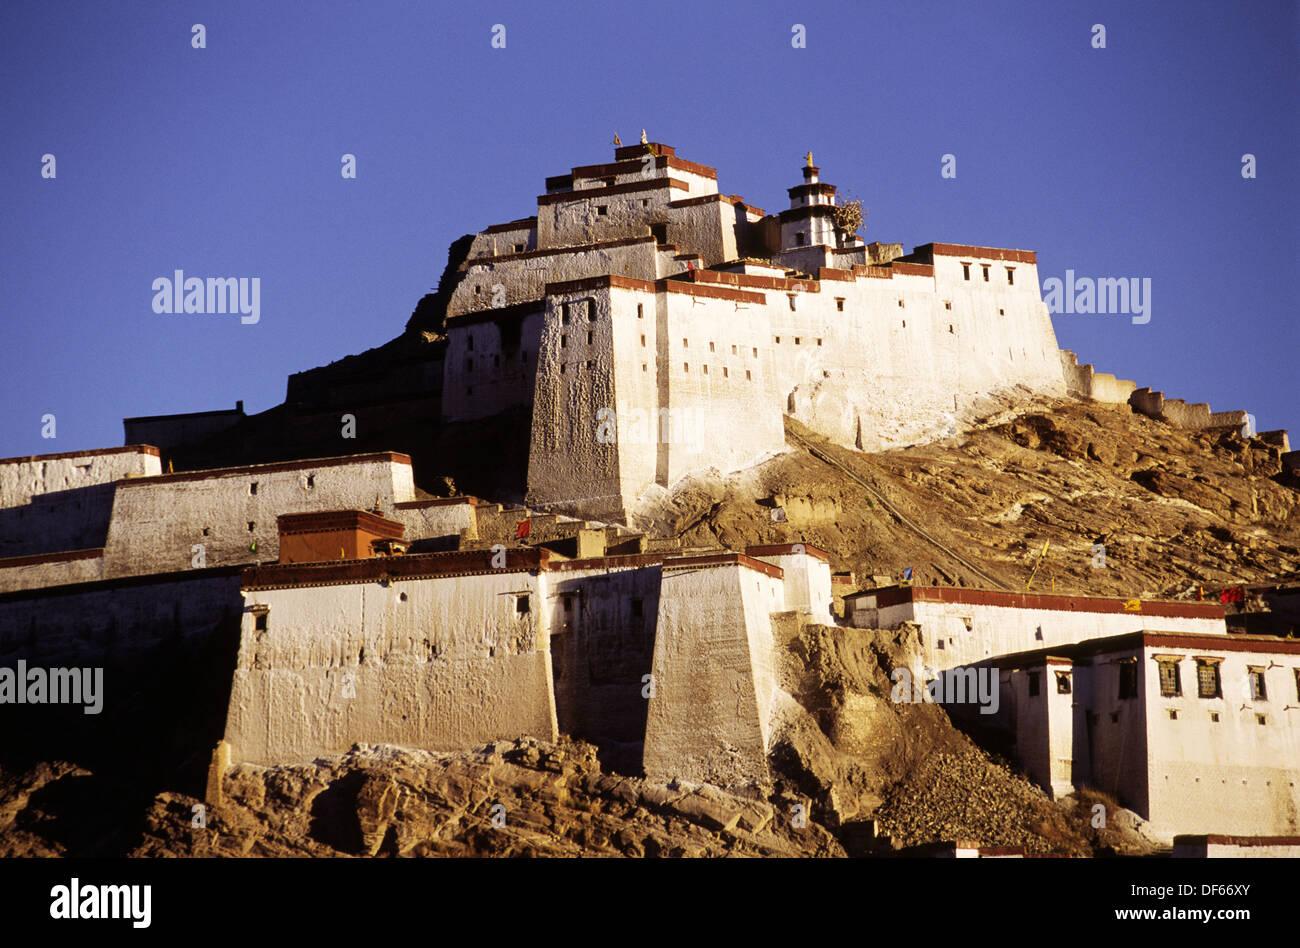 14 century Gyantse fort; now a Anti-British Imperialist Museum inside. Gyantse. Tibet. China - Stock Image